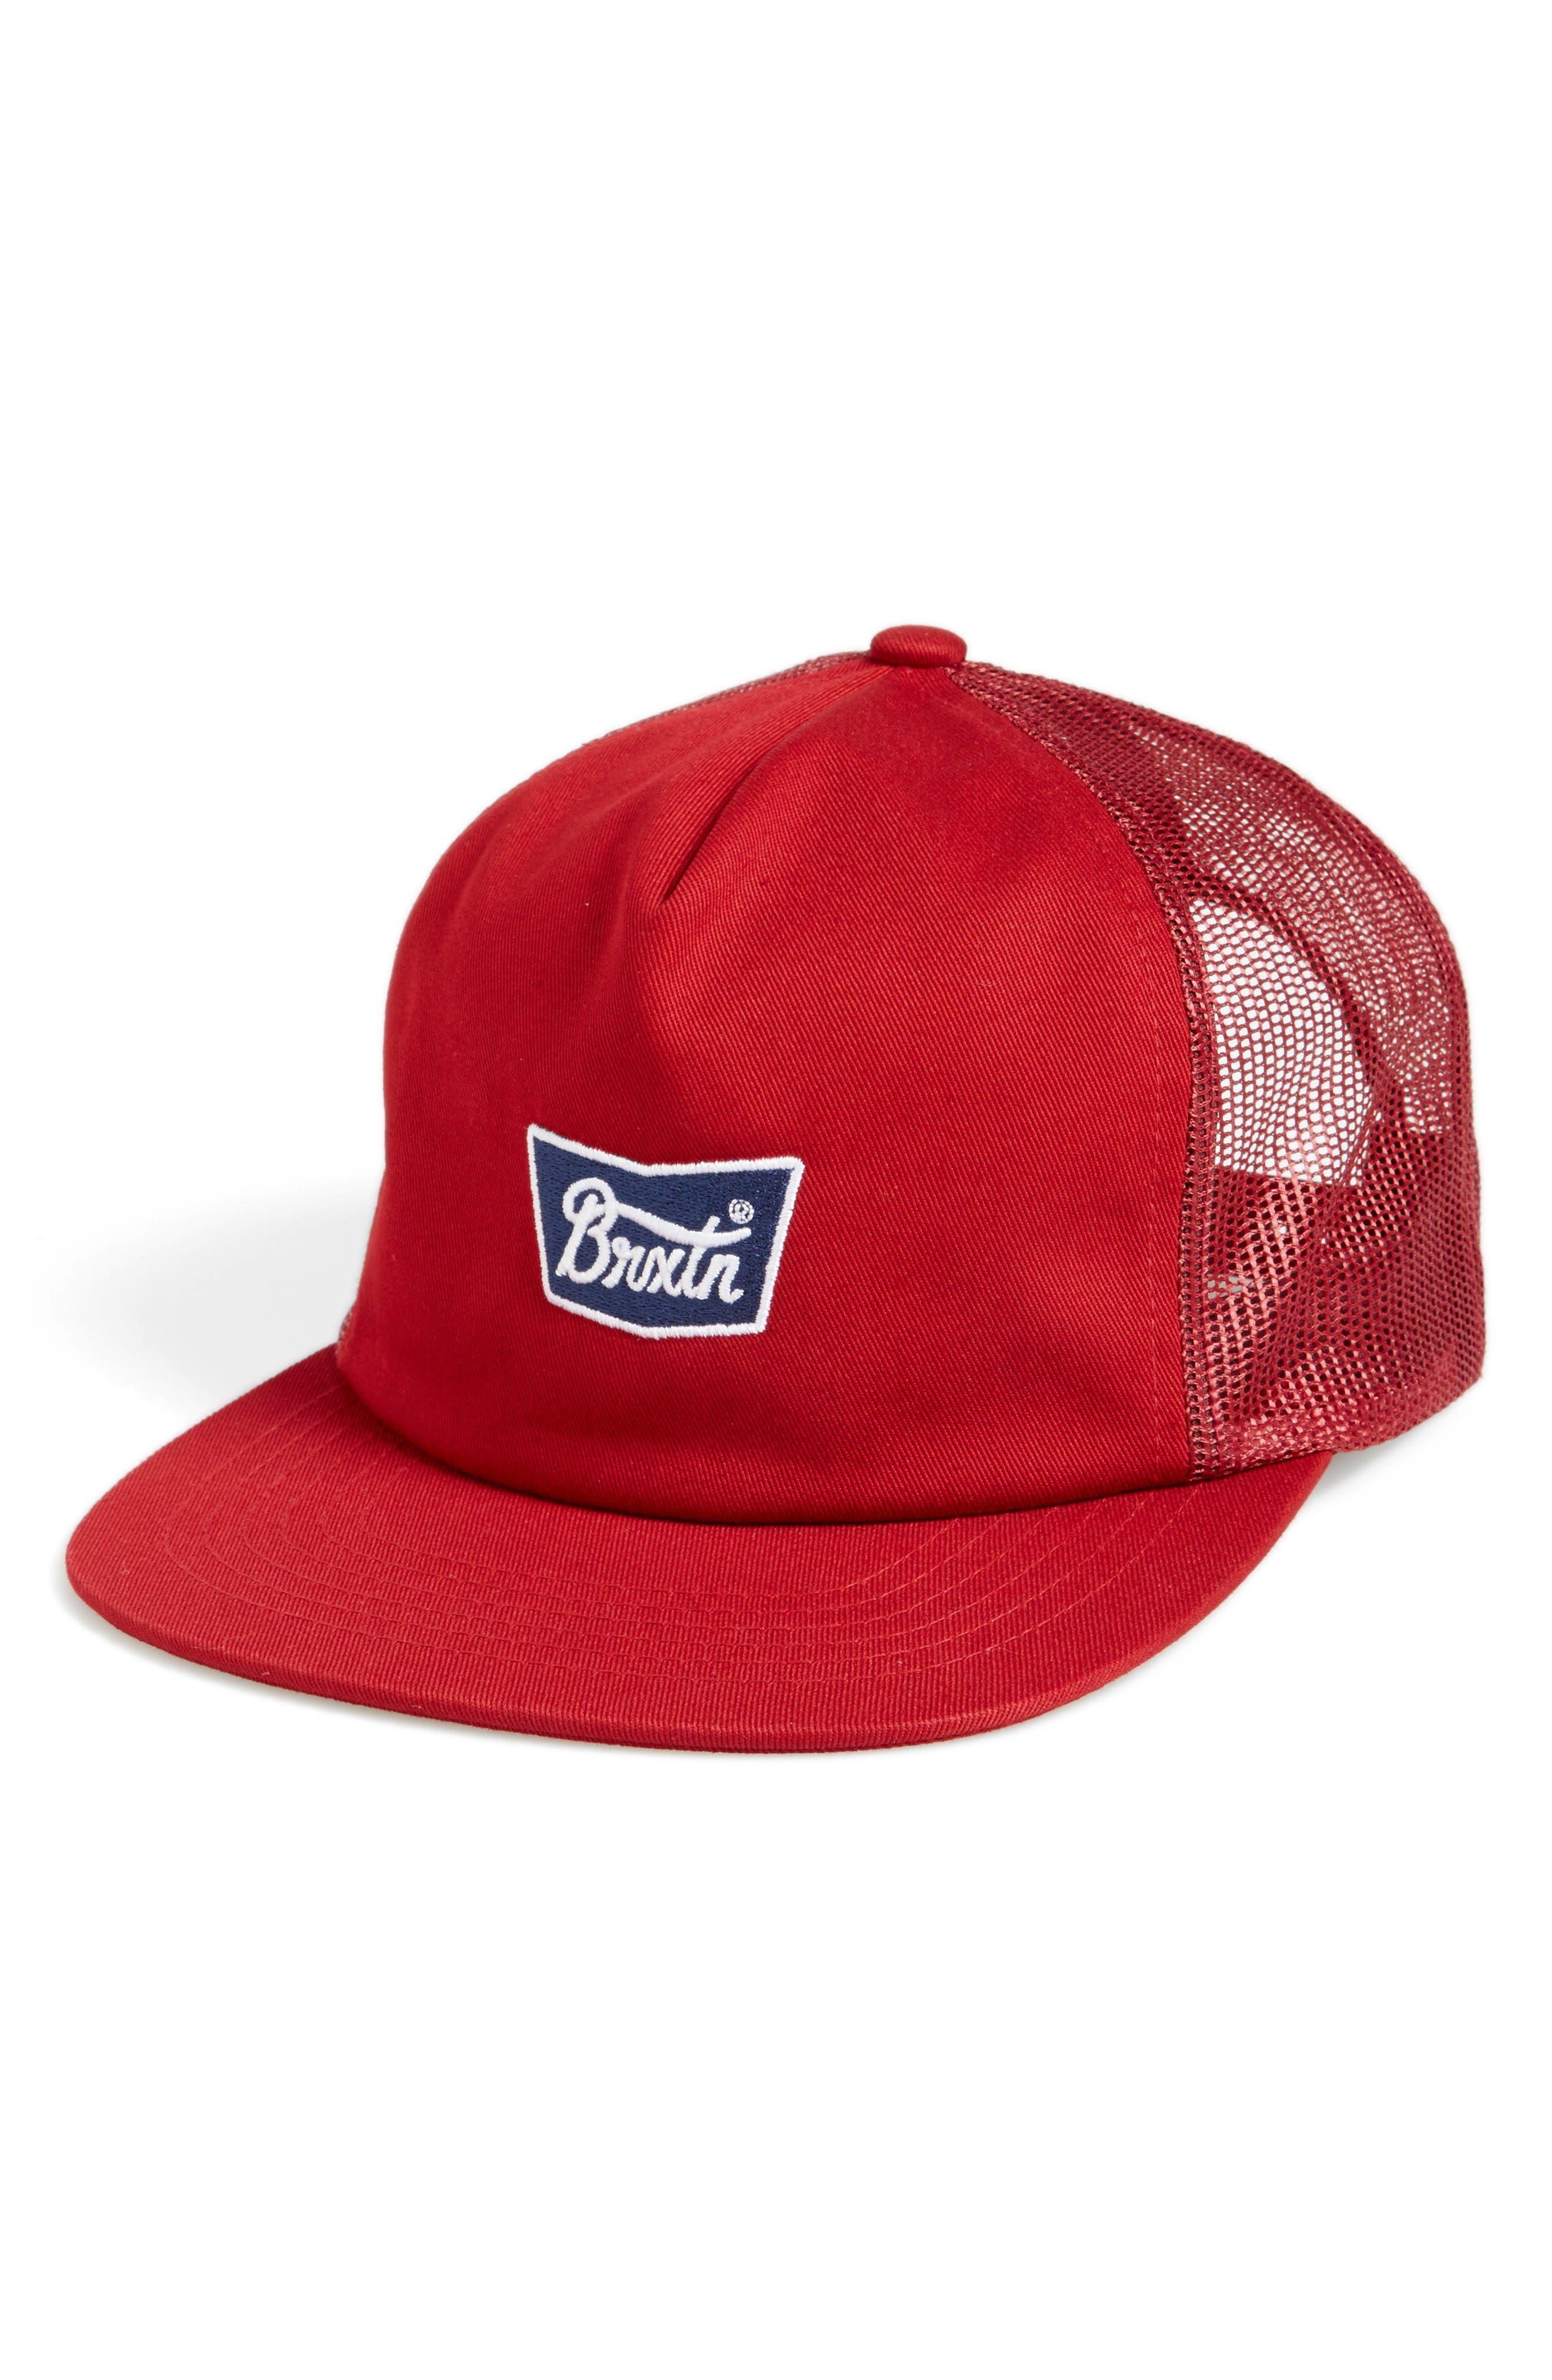 Brixton Stith Mesh Snapback Baseball Cap